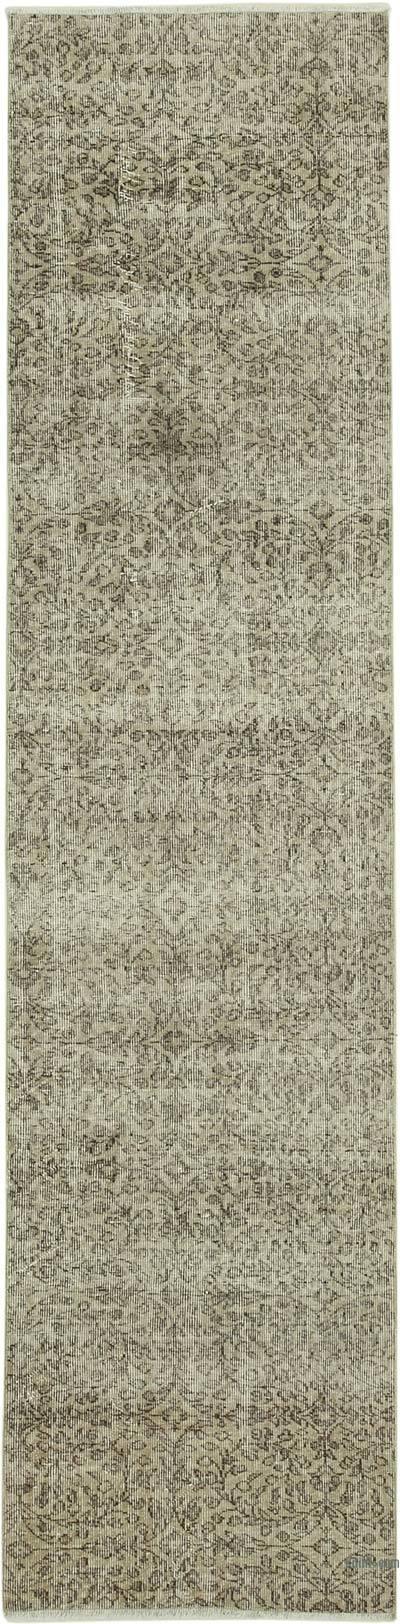 Vintage Anadolu Yolluk - 76 cm x 313 cm